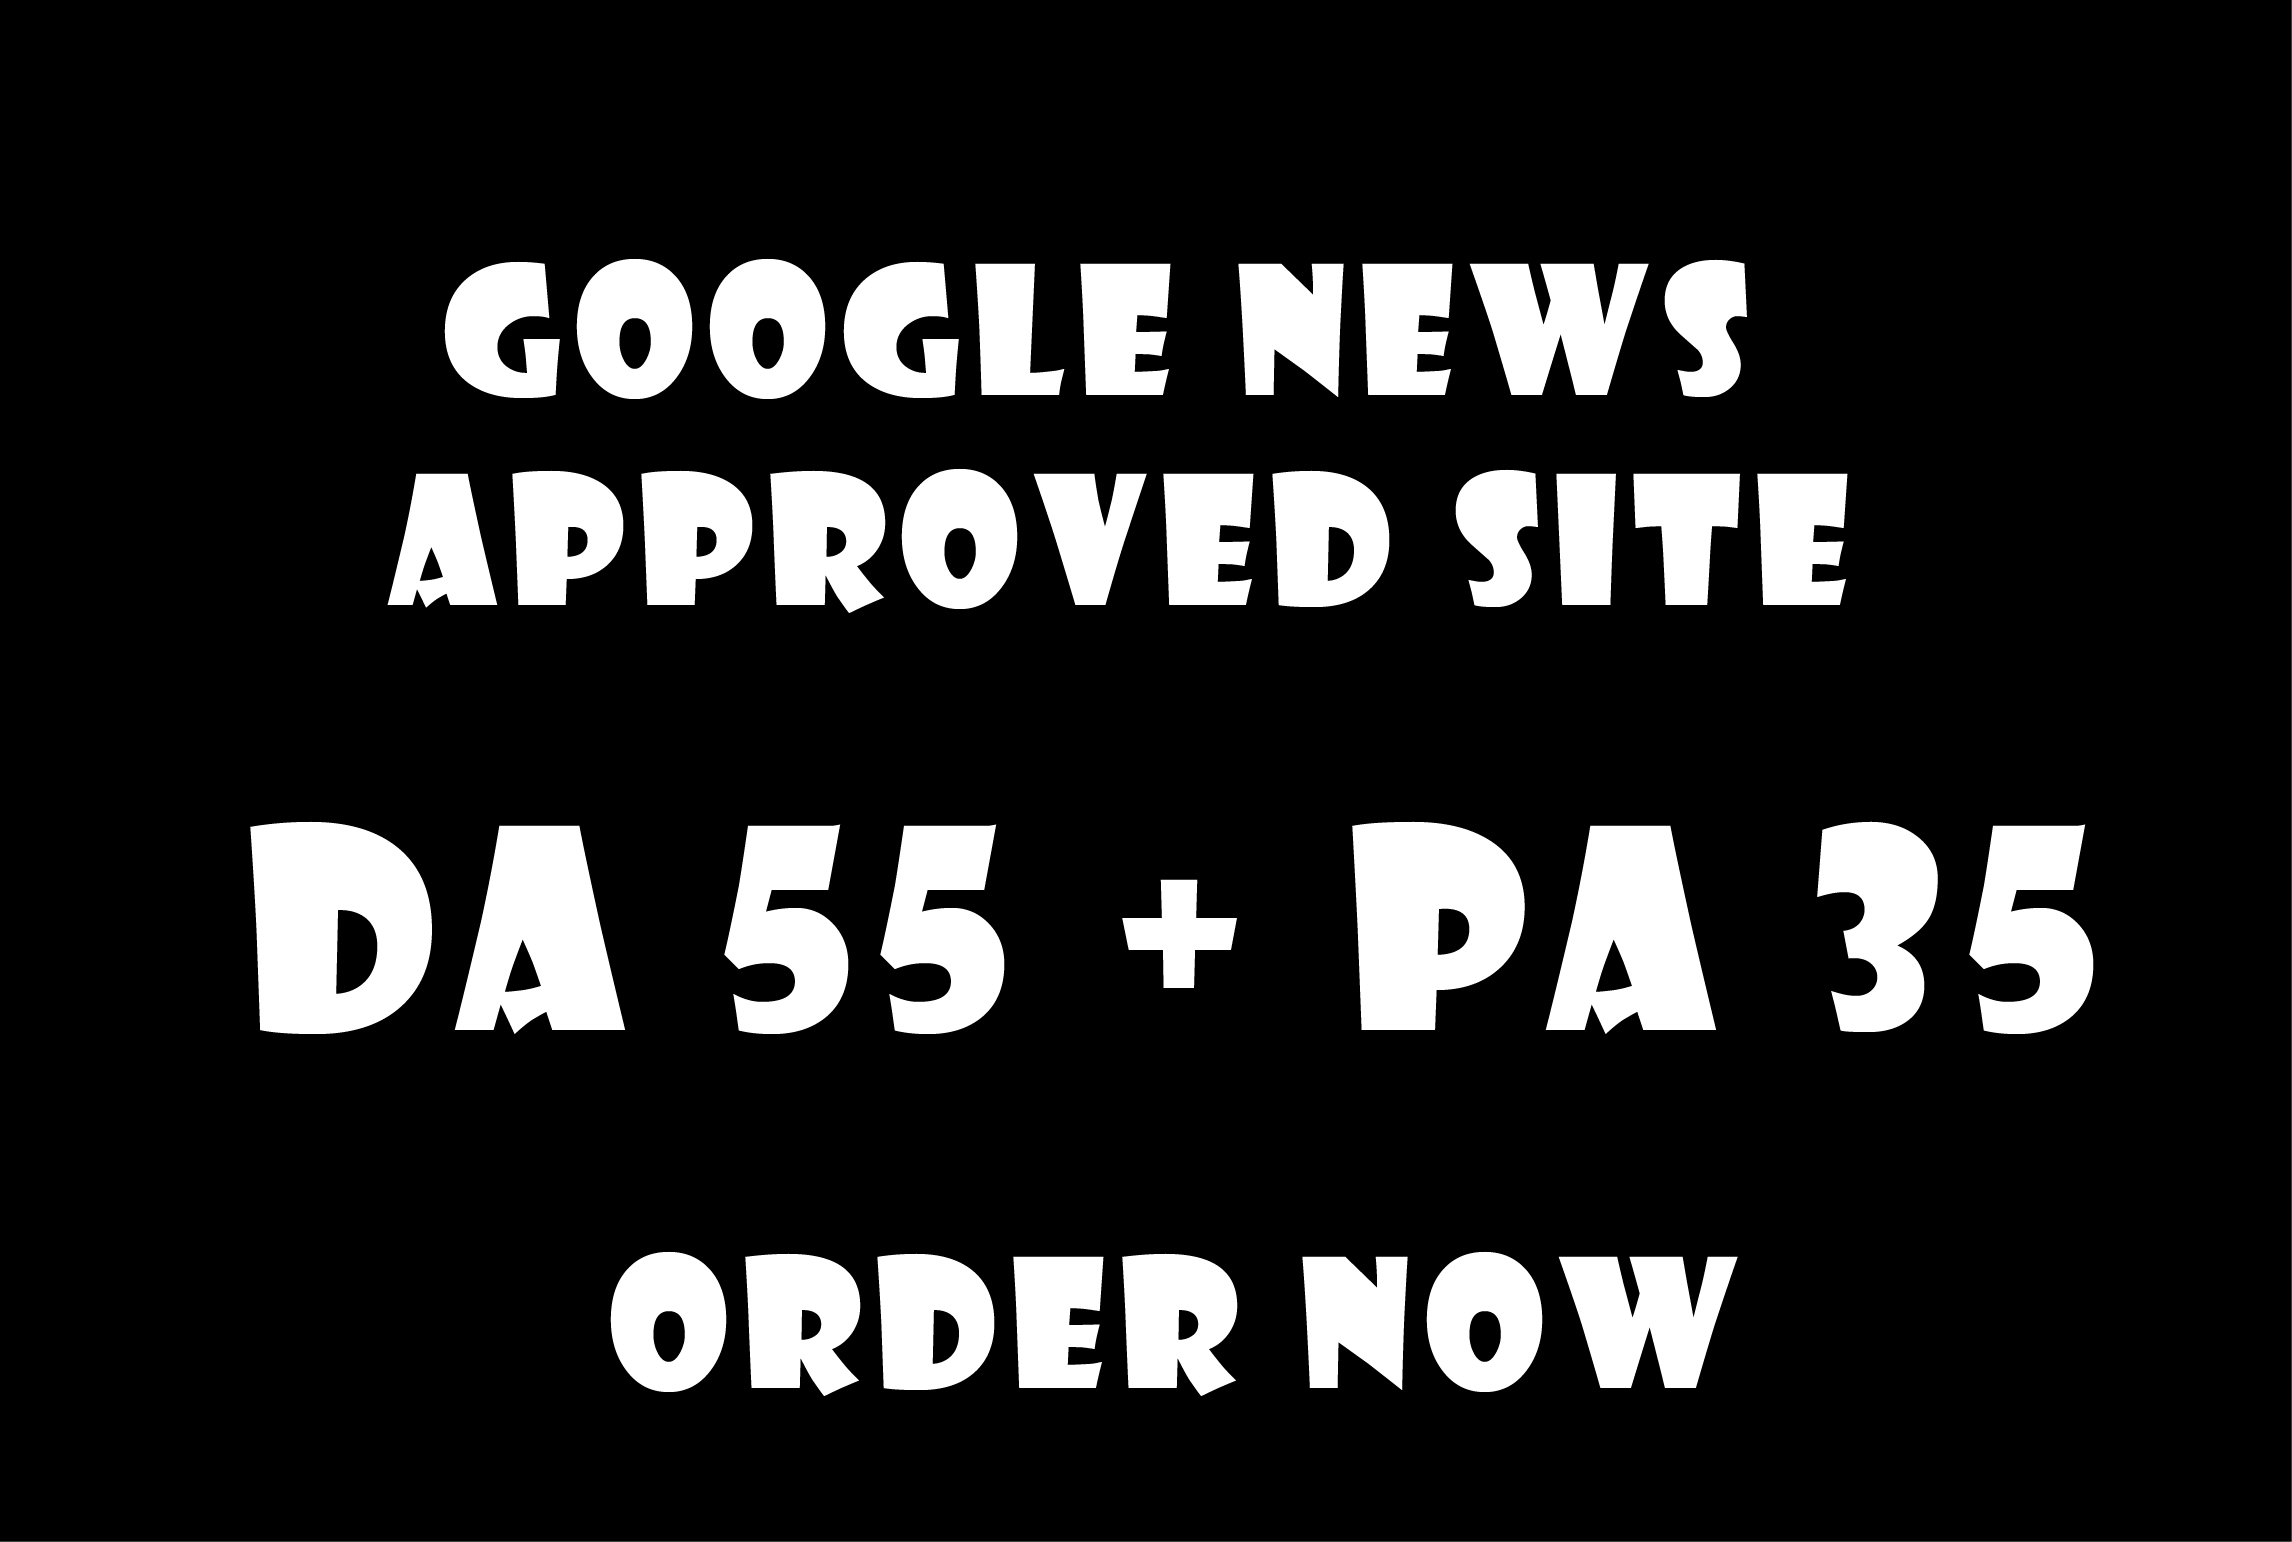 Publish guest post on hvtimes da 55 google news approved website